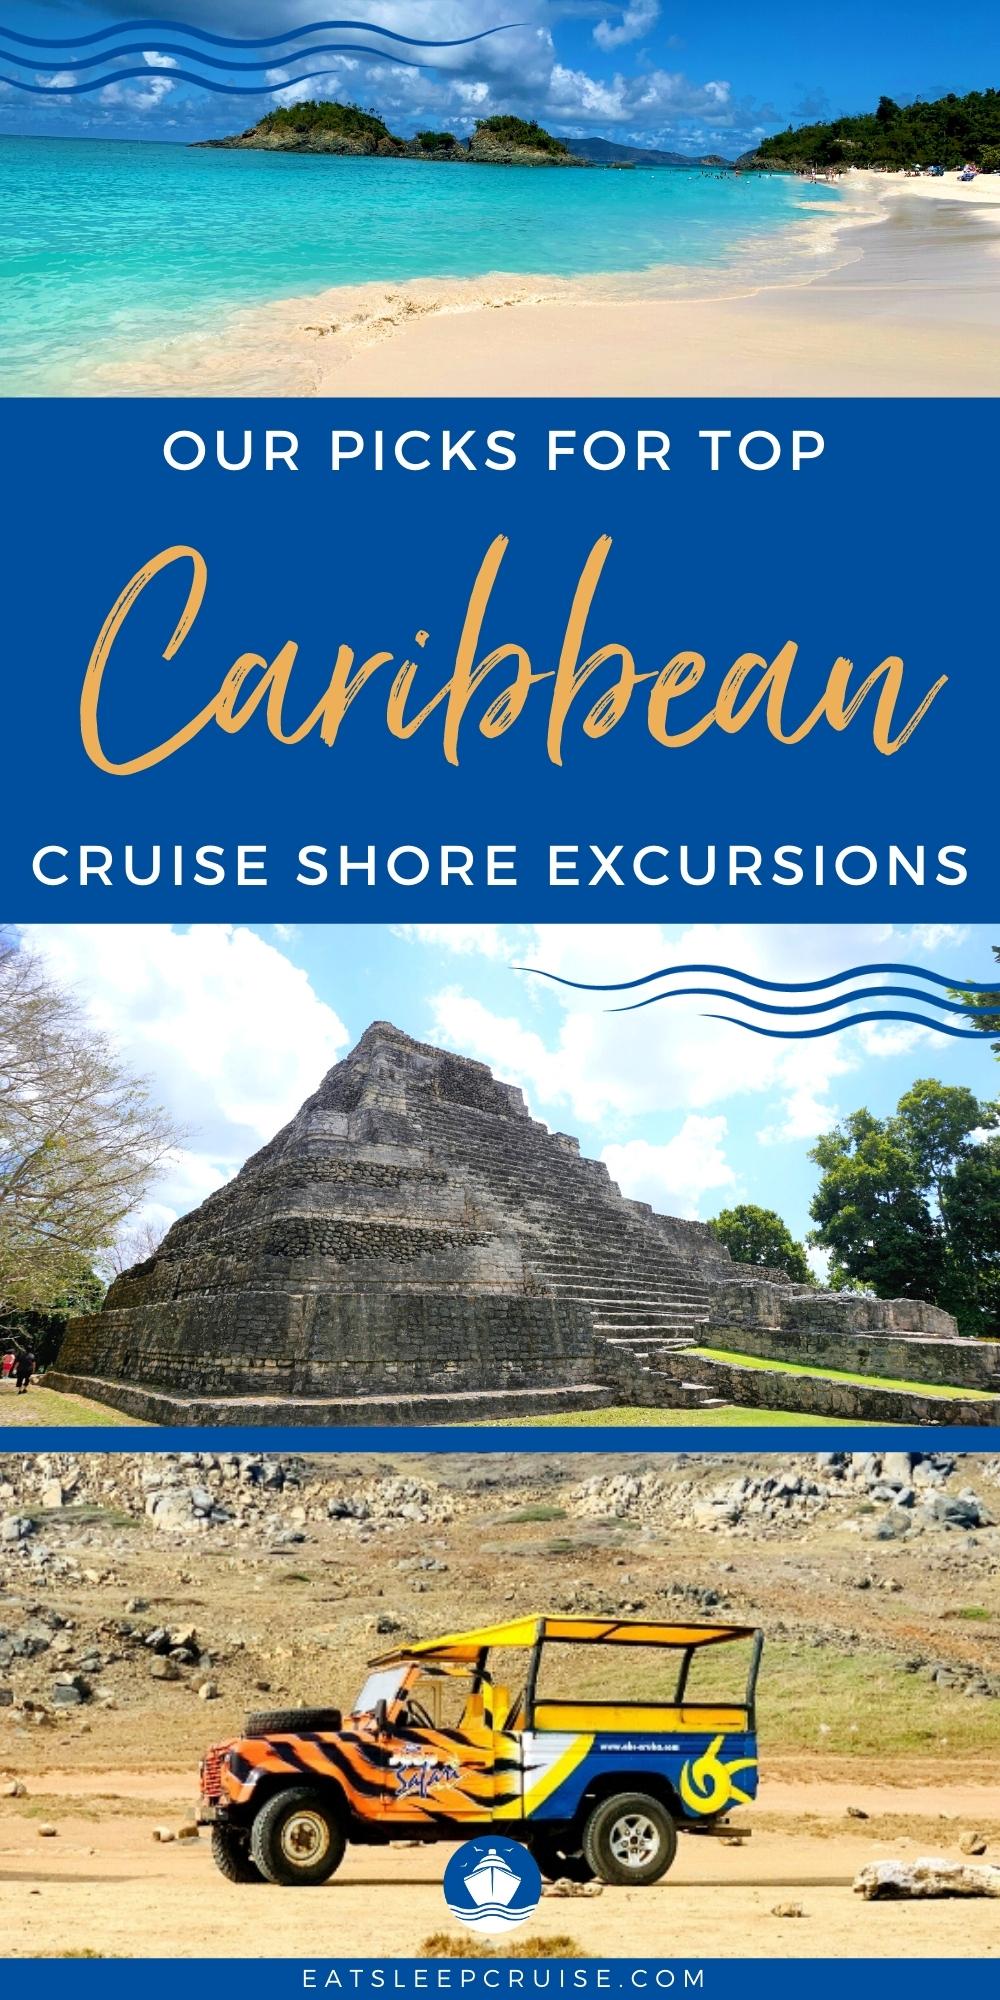 Caribbean Cruise Shore Excursions